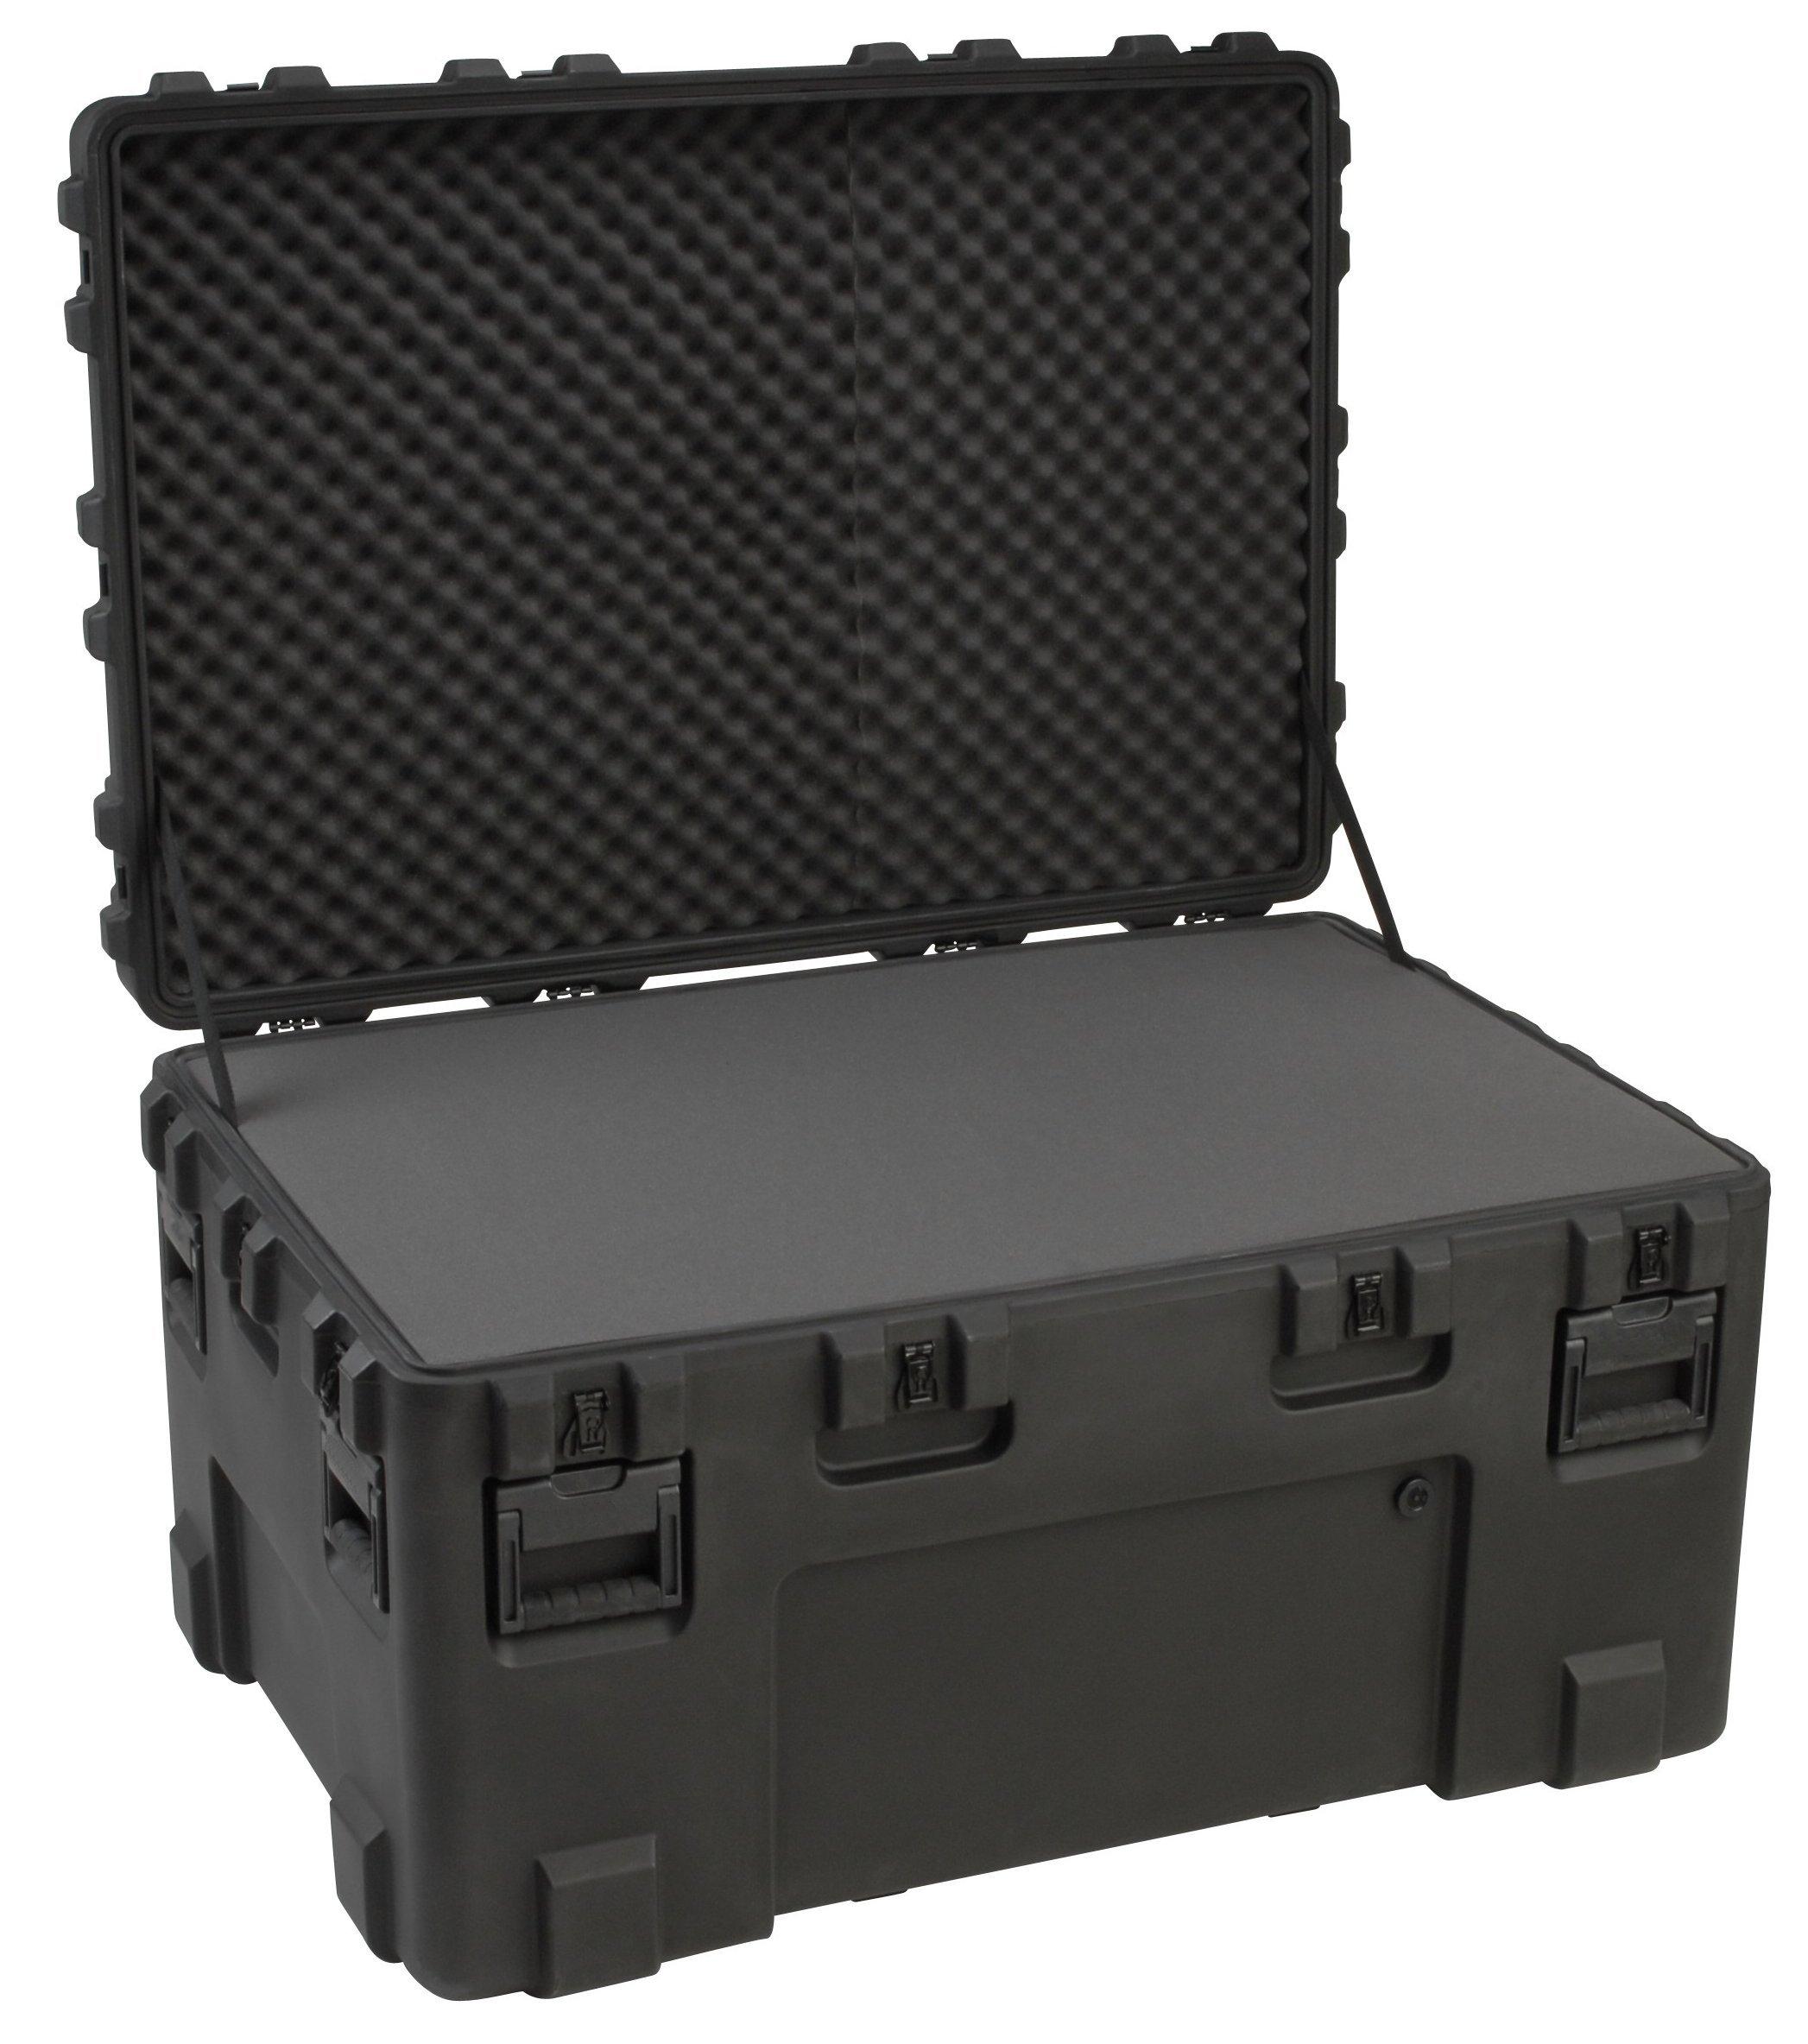 CC4530243RSK Case